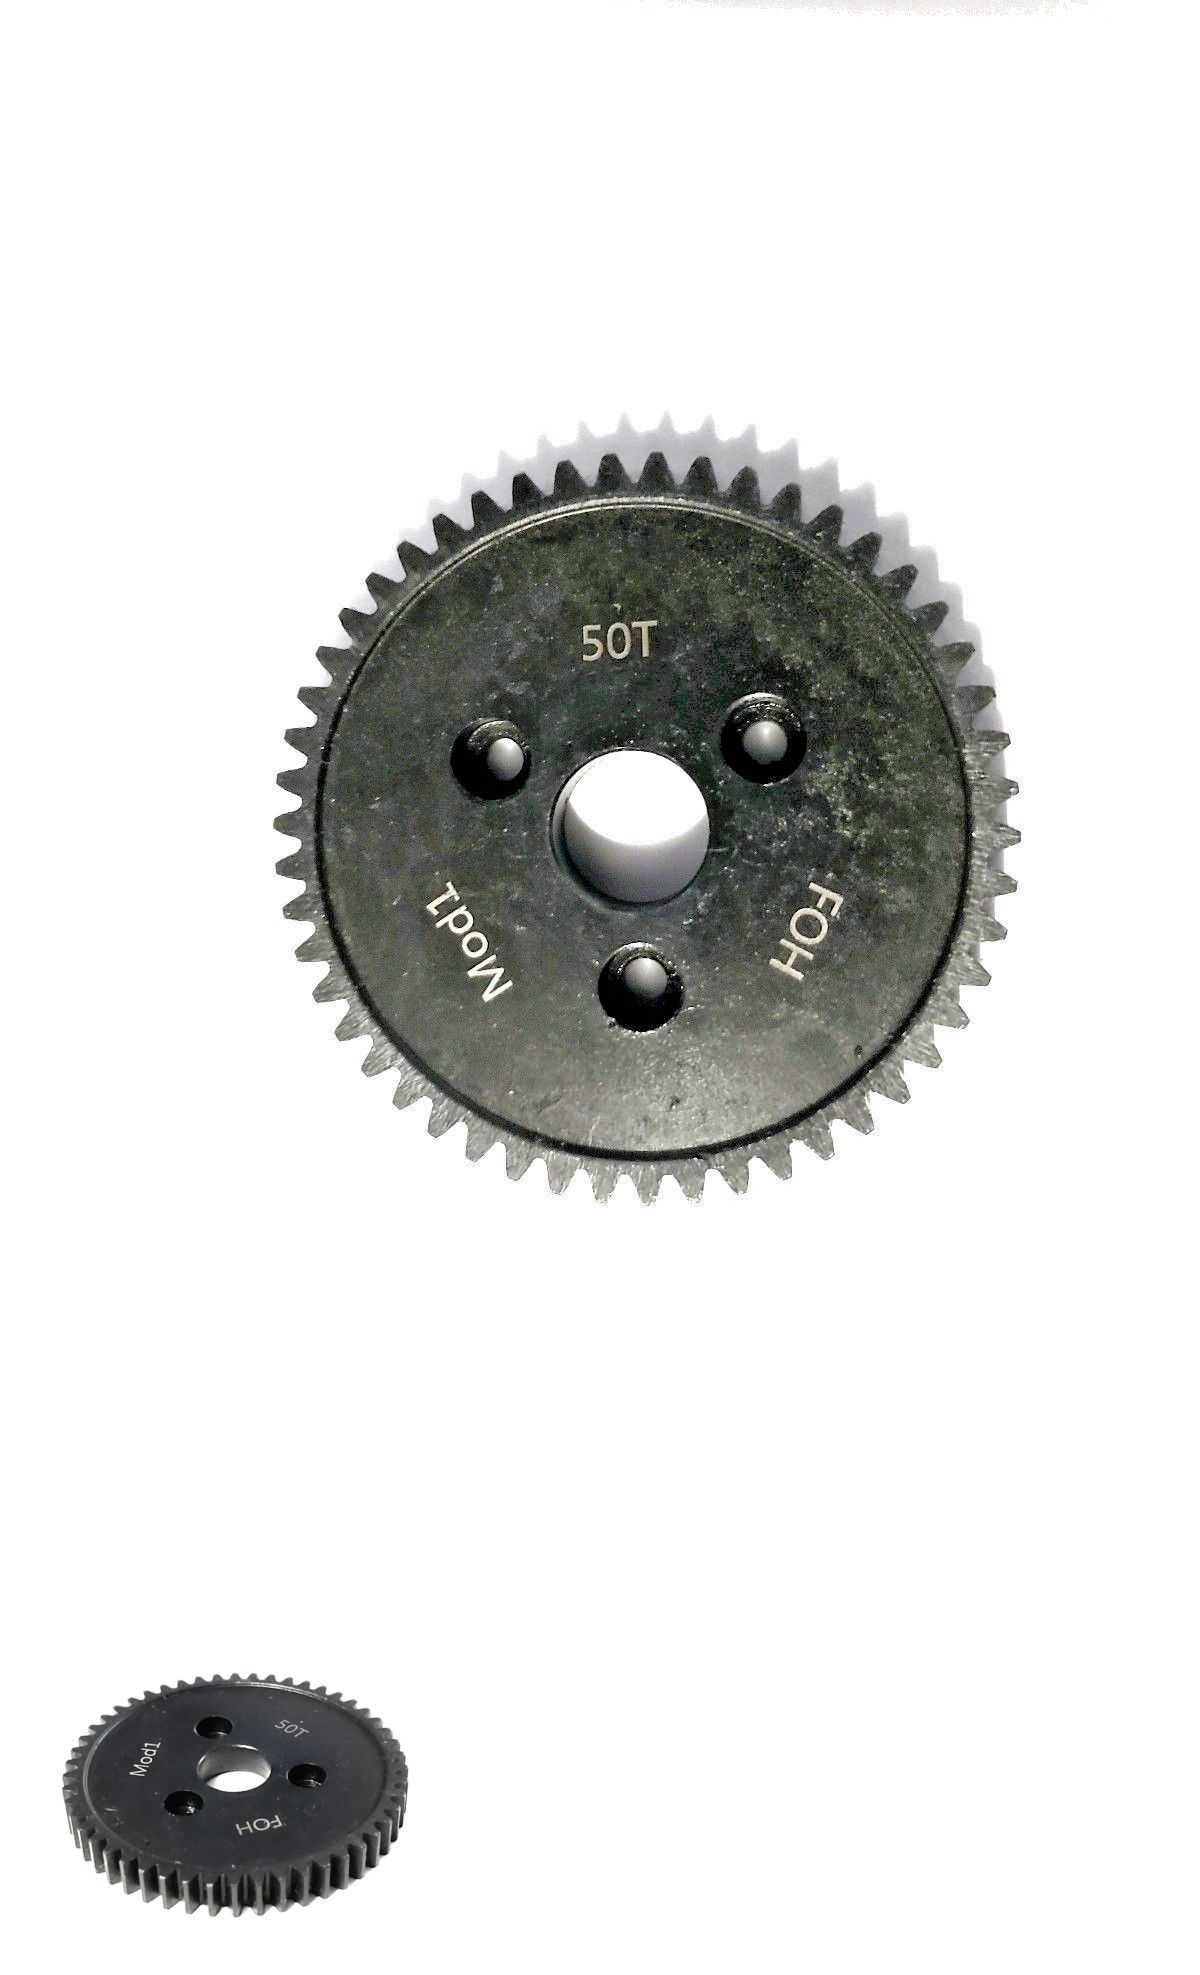 44T MOD-1 FOH SPUR GEAR TRAXXAS////OFNA//MUGEN//SERPEN//HOBAO//HPI//LOSI//ARRMA//XLX//XL2